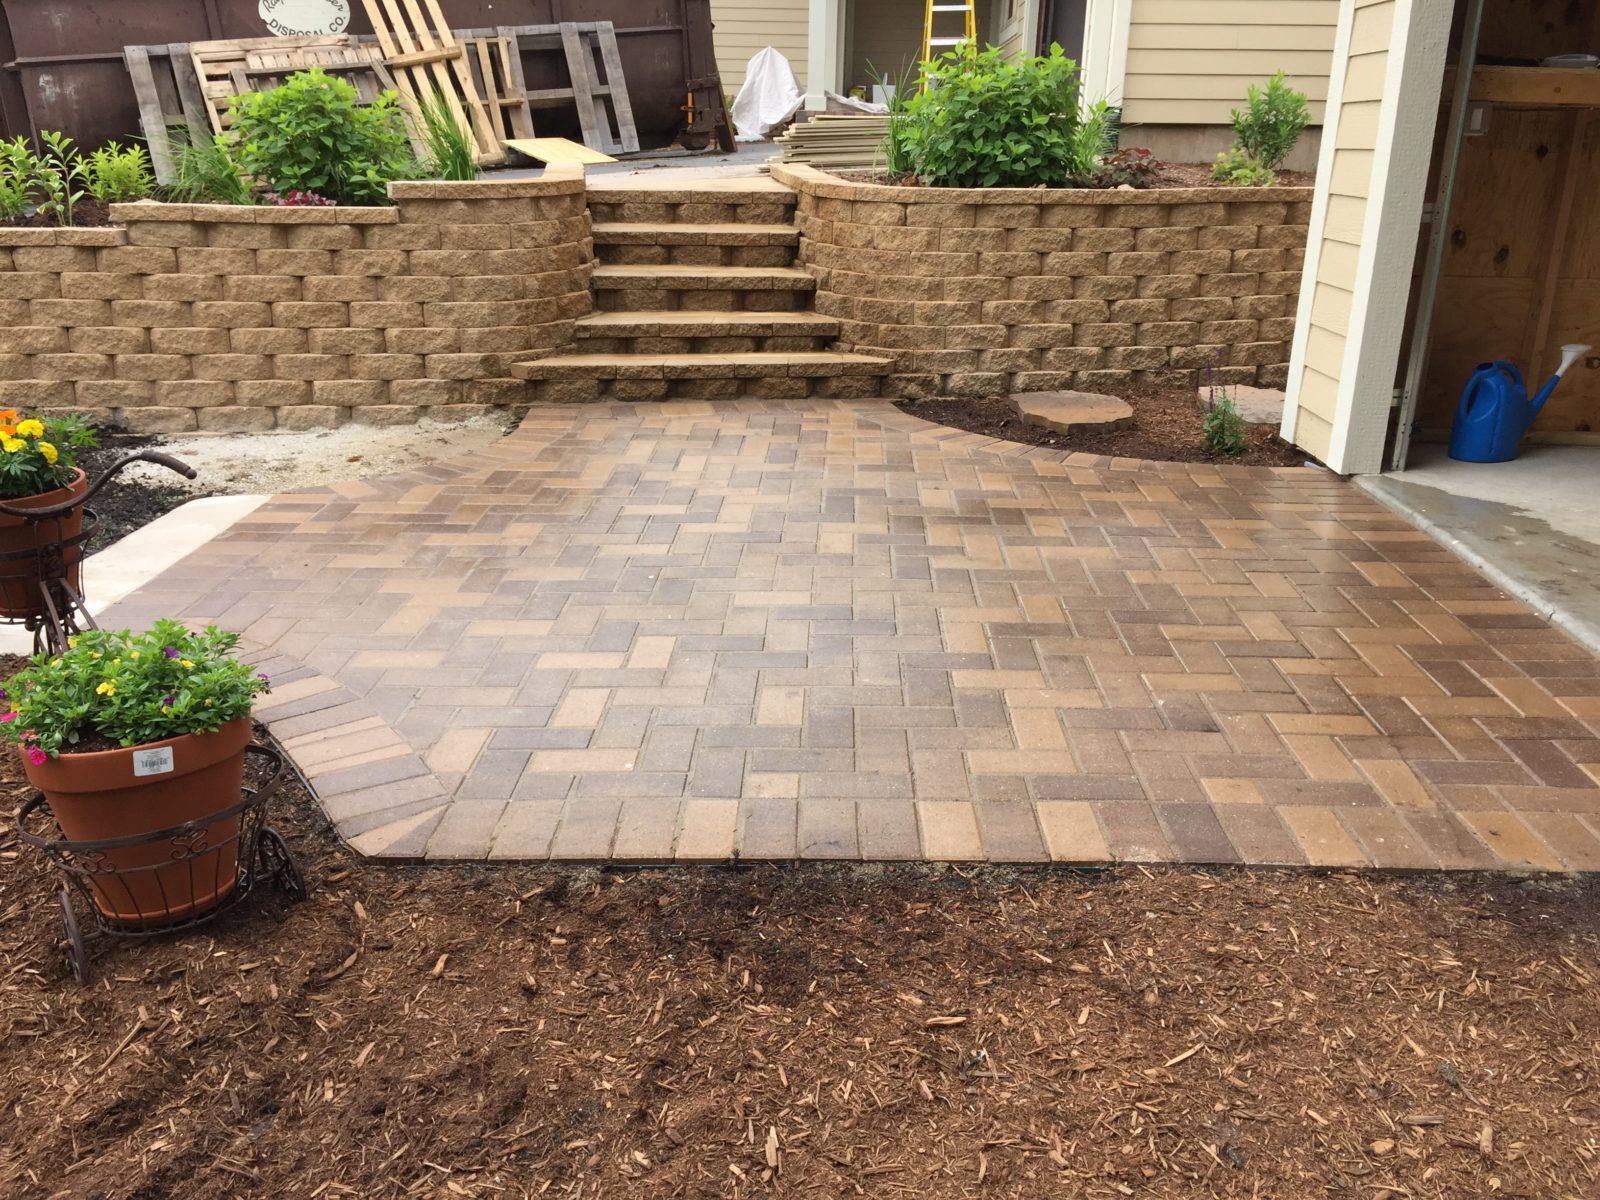 Brick Pavers | Driveways | Patios | Walkways | Landcare ... on Brick Paver Patio Designs  id=73544